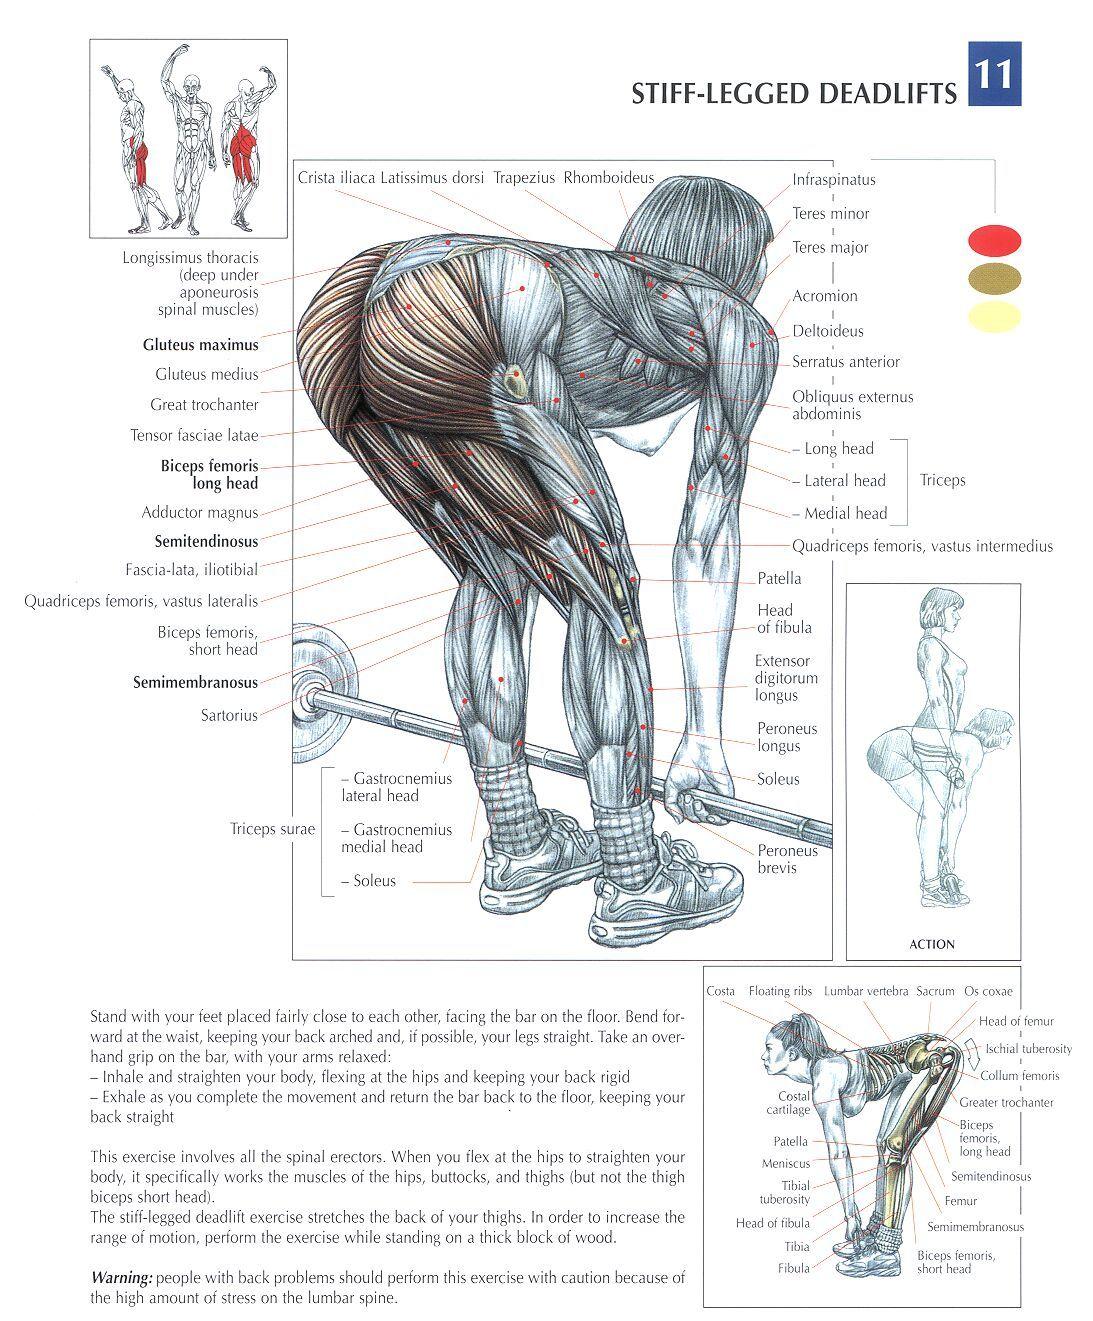 Stiff legged deadlift muscles used. | Weight loss | Pinterest ...